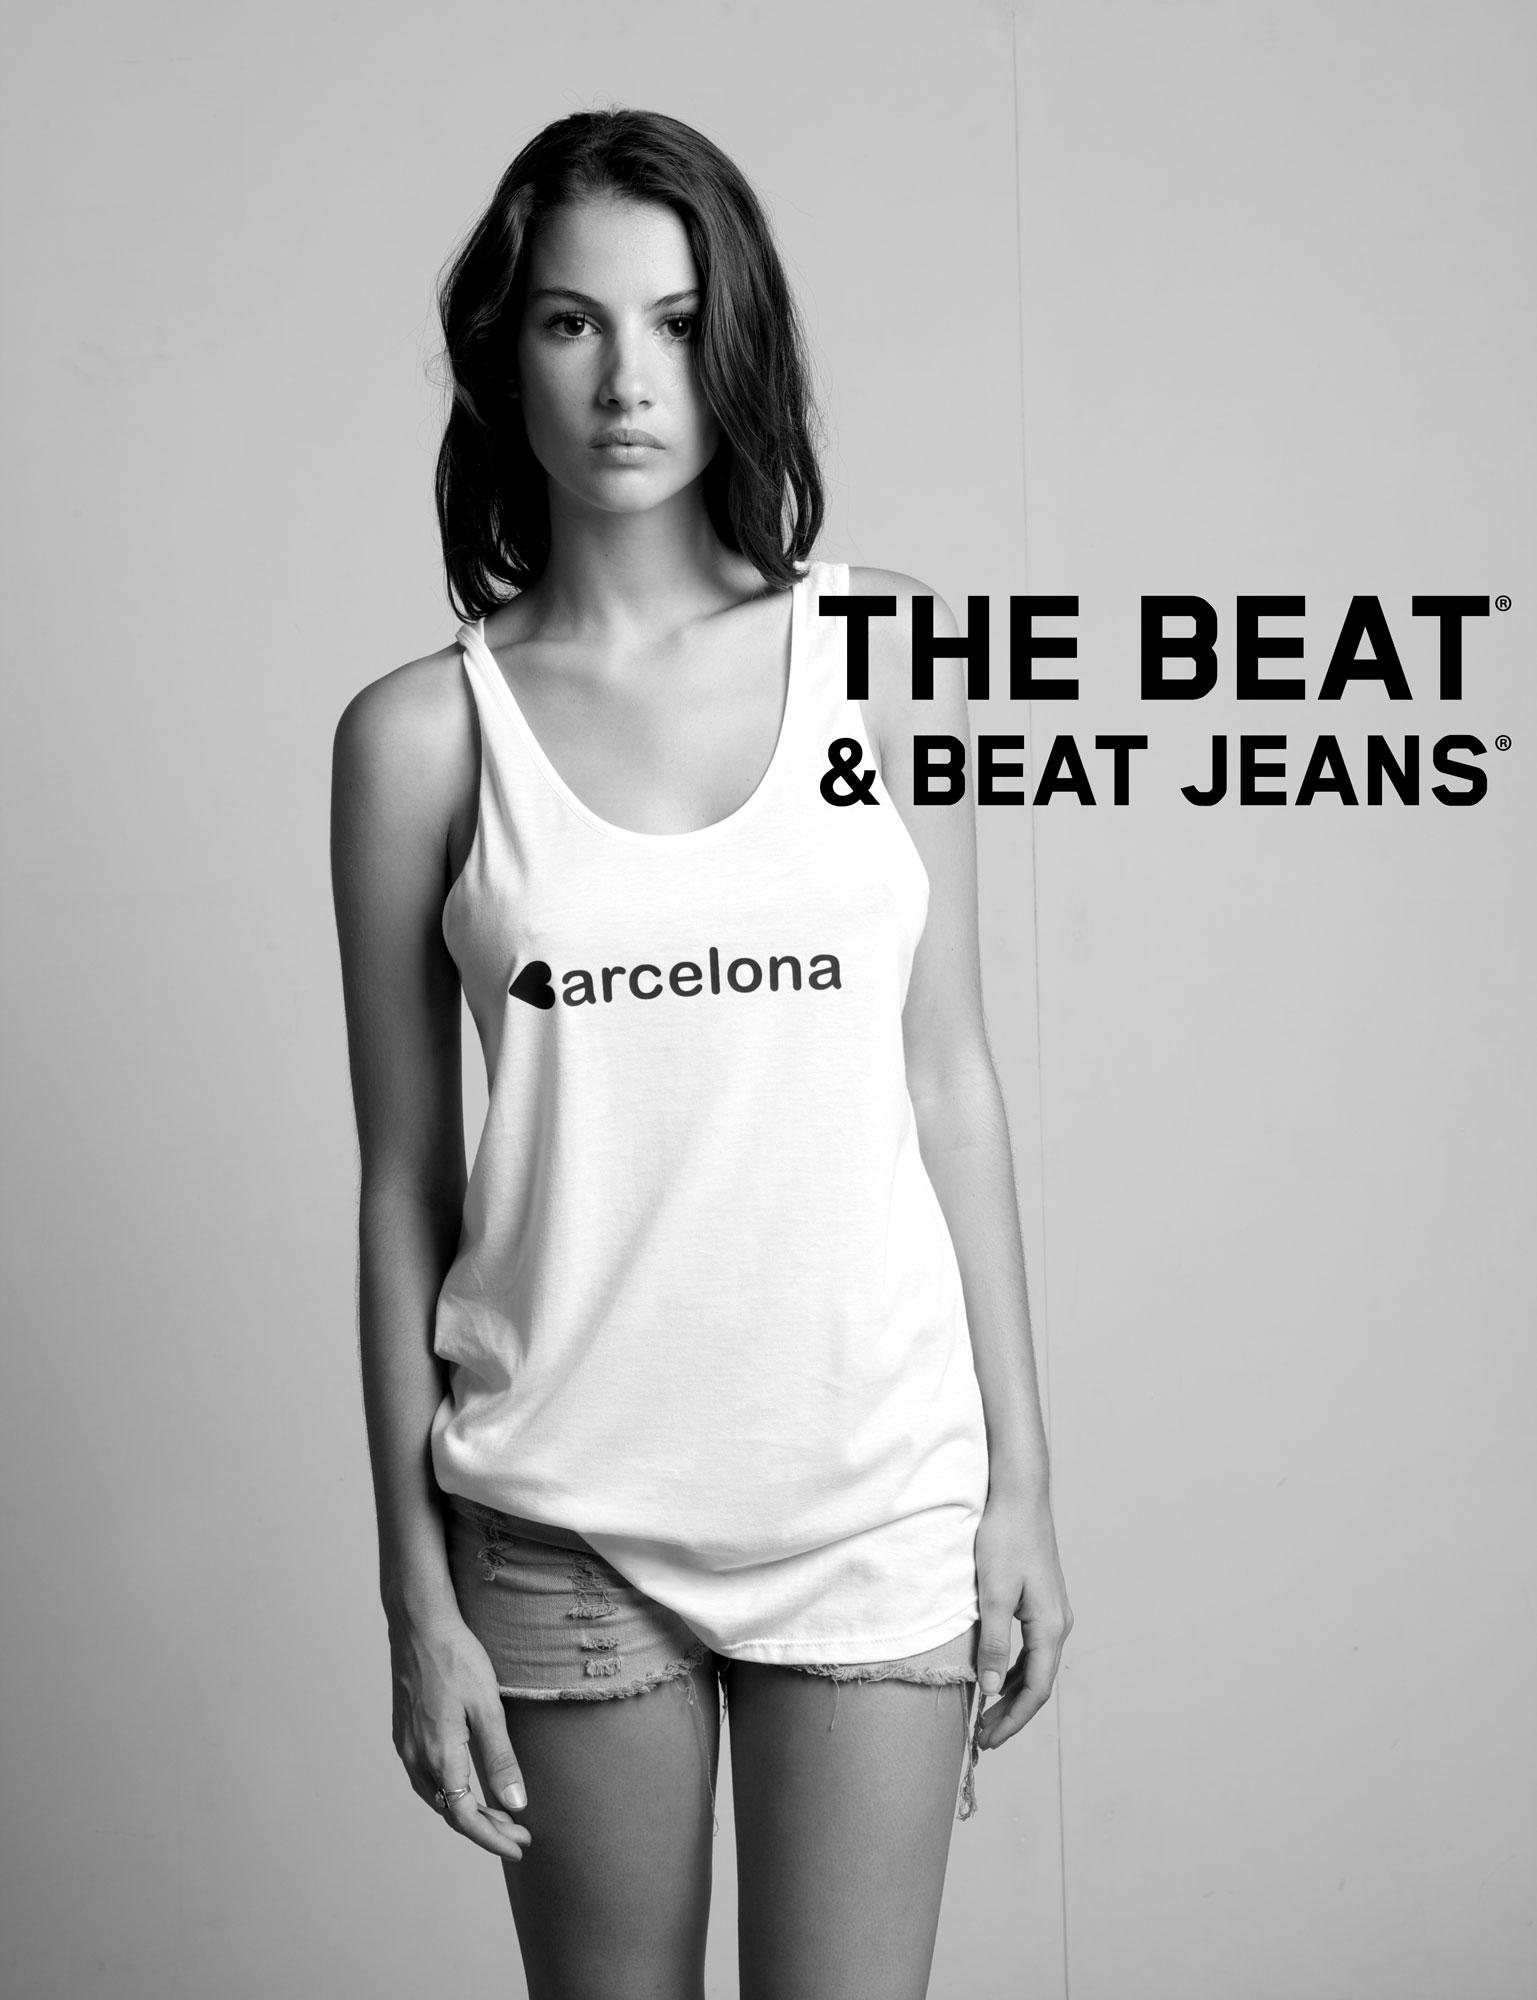 TheBeat_T-Shirt_Barcelona